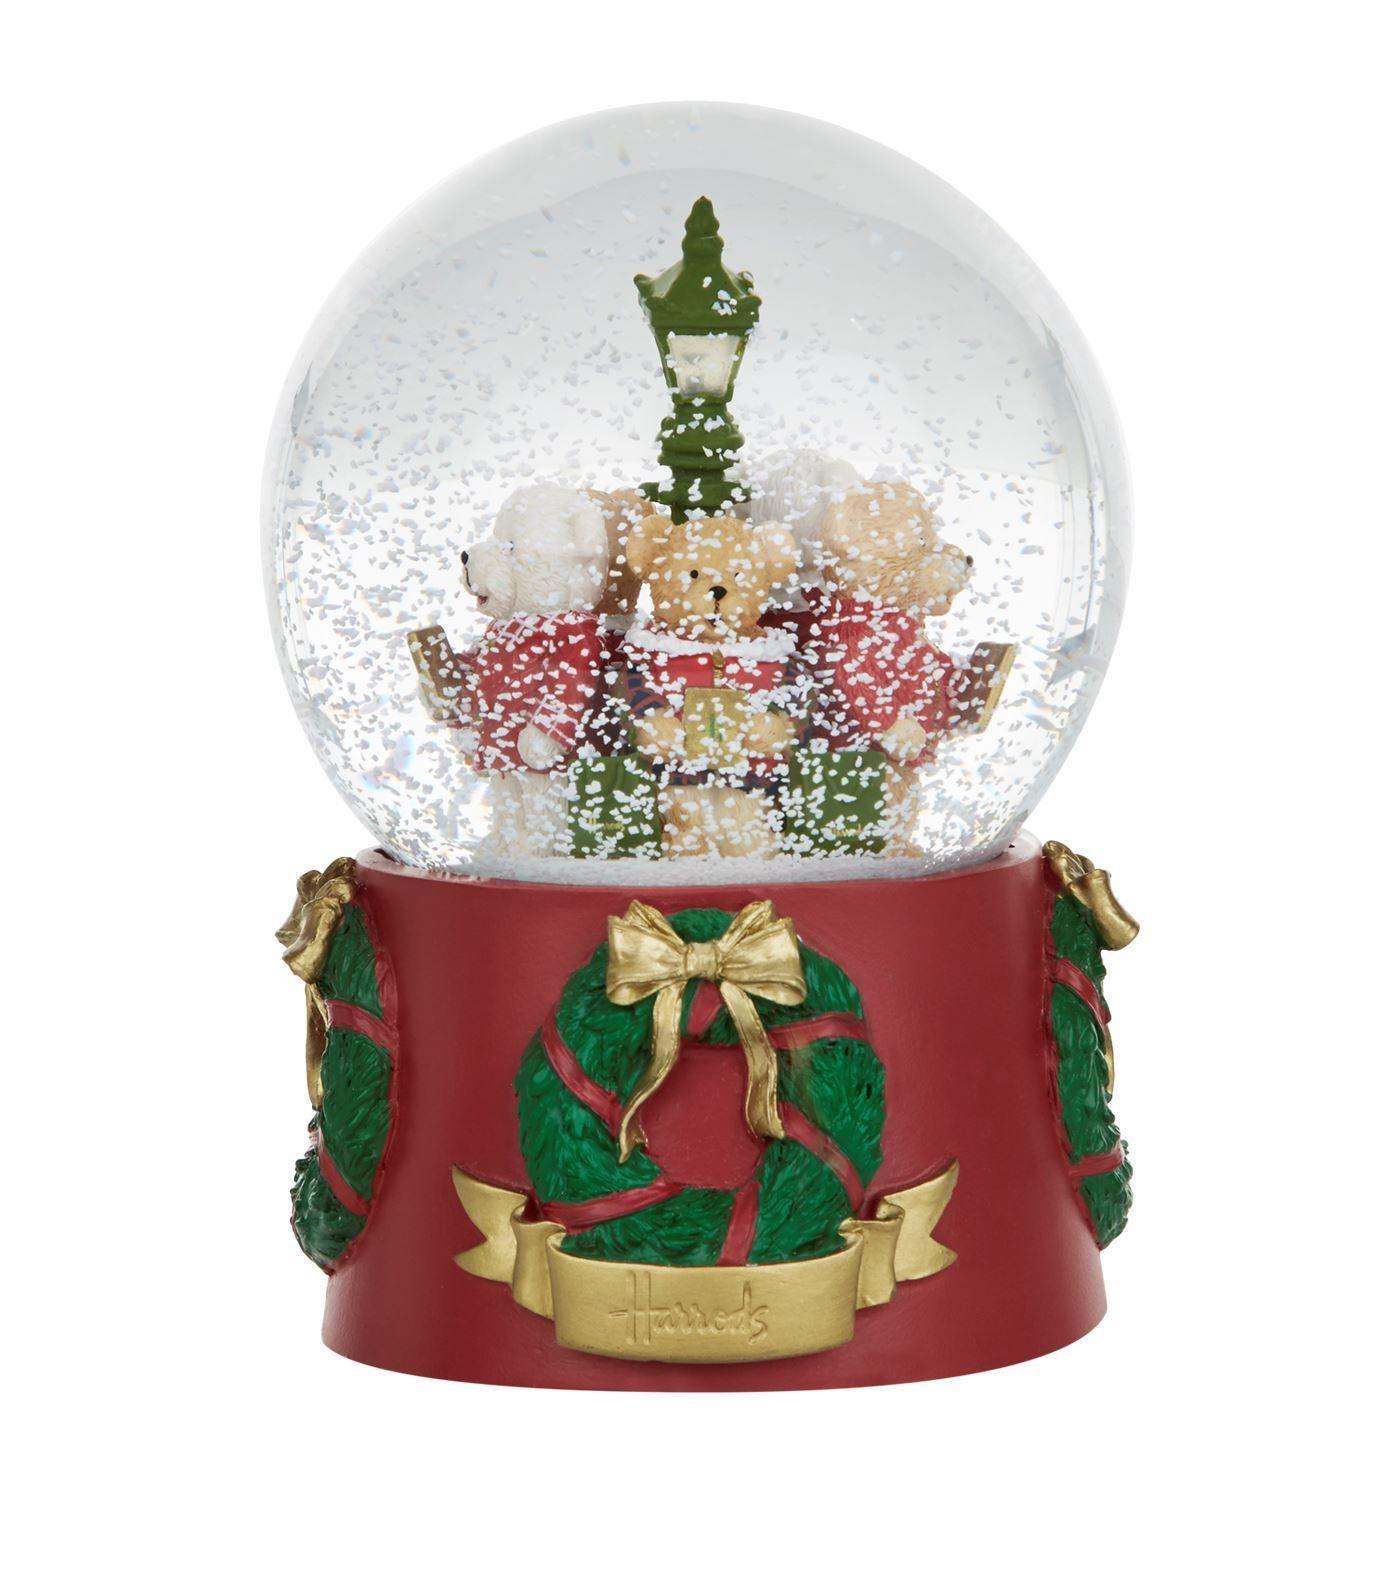 [Harrods] ハロッズ 2017年限定 クリスマス テディベア スノードーム ライトアップ機能付き / Christmas Bear Light Up Snow Globe